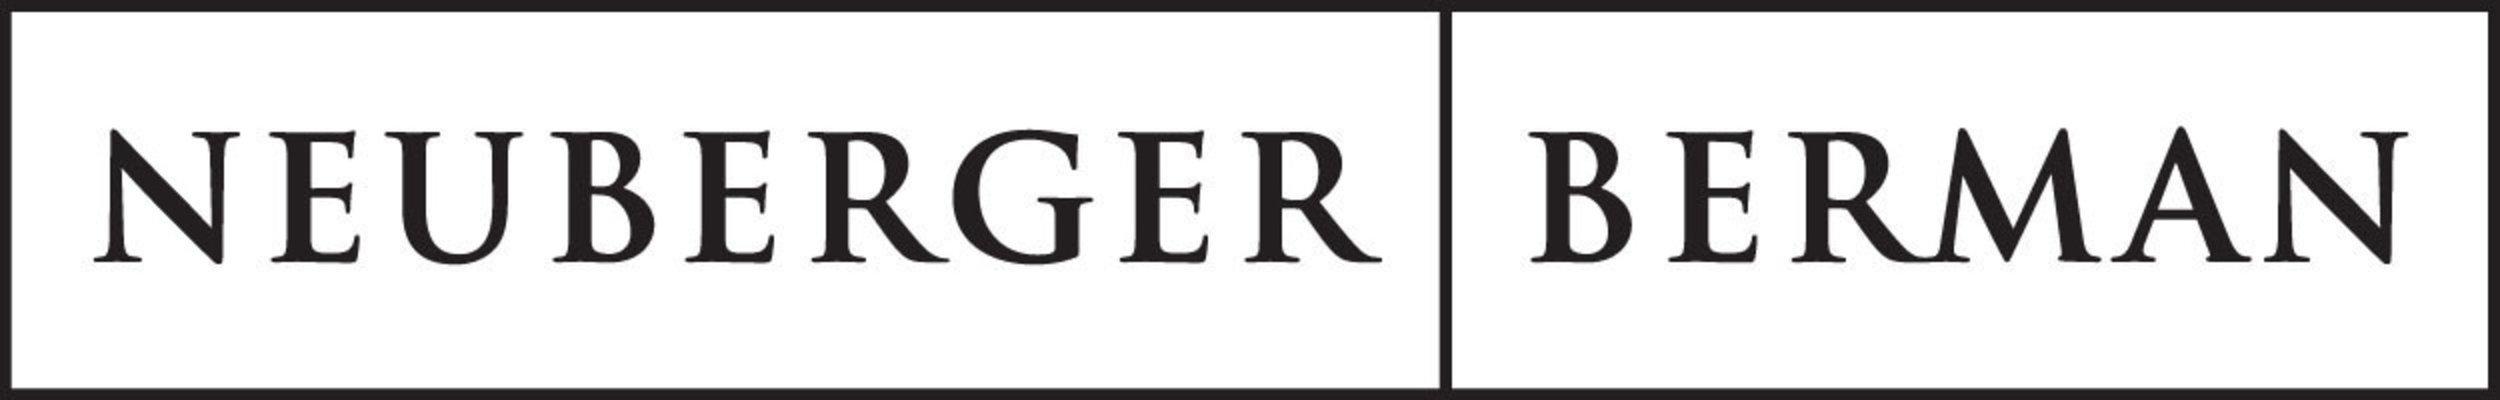 Neuberger Berman Foundation